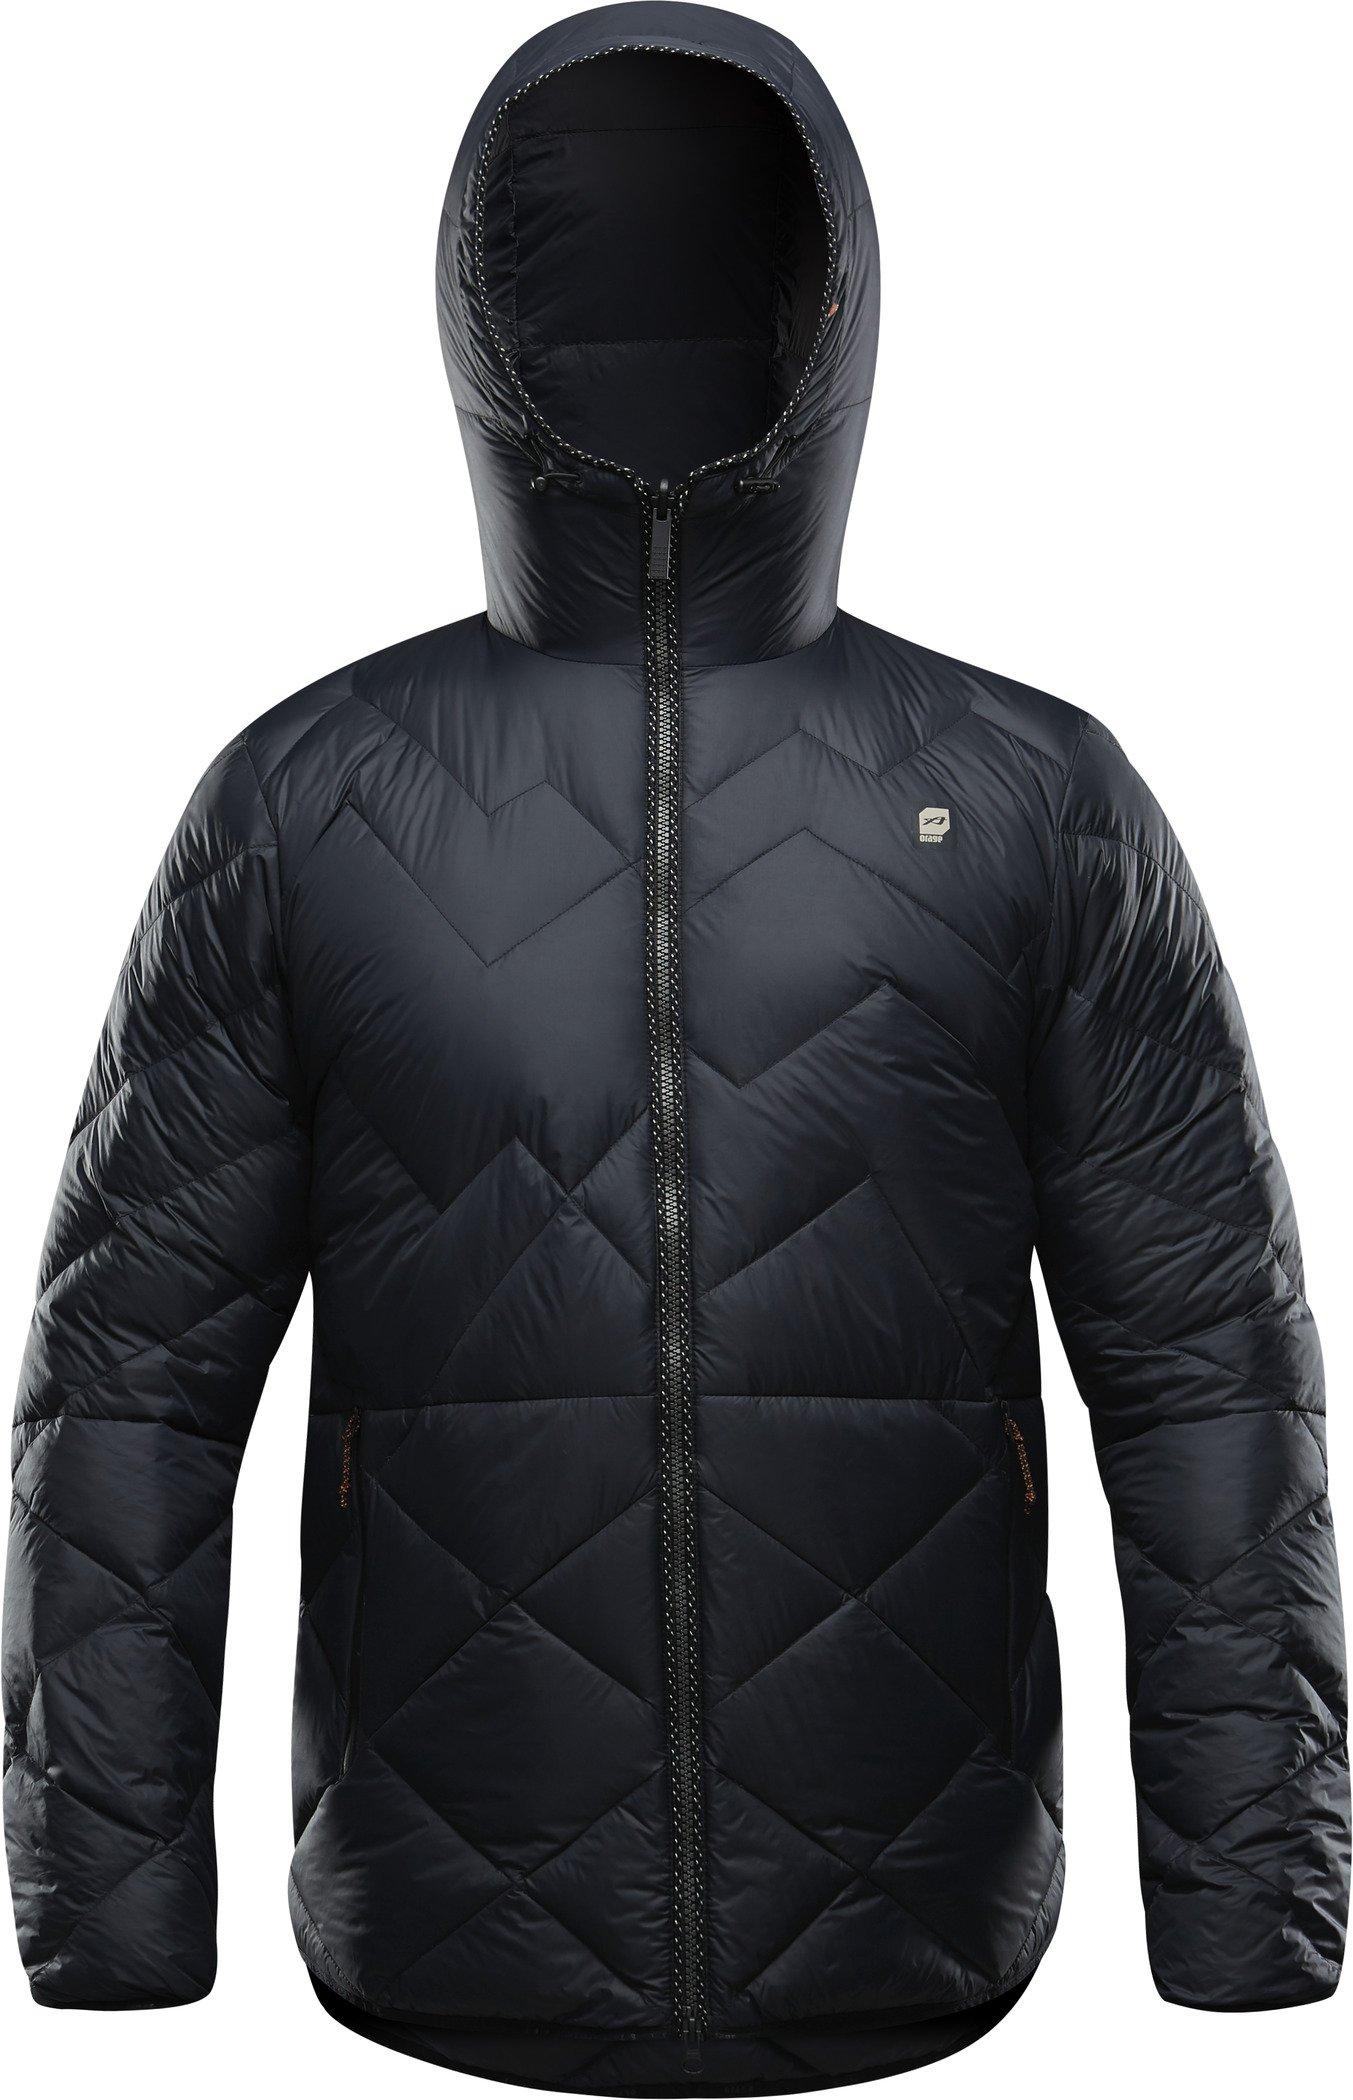 orage Men's Newton Coat, Black, Large